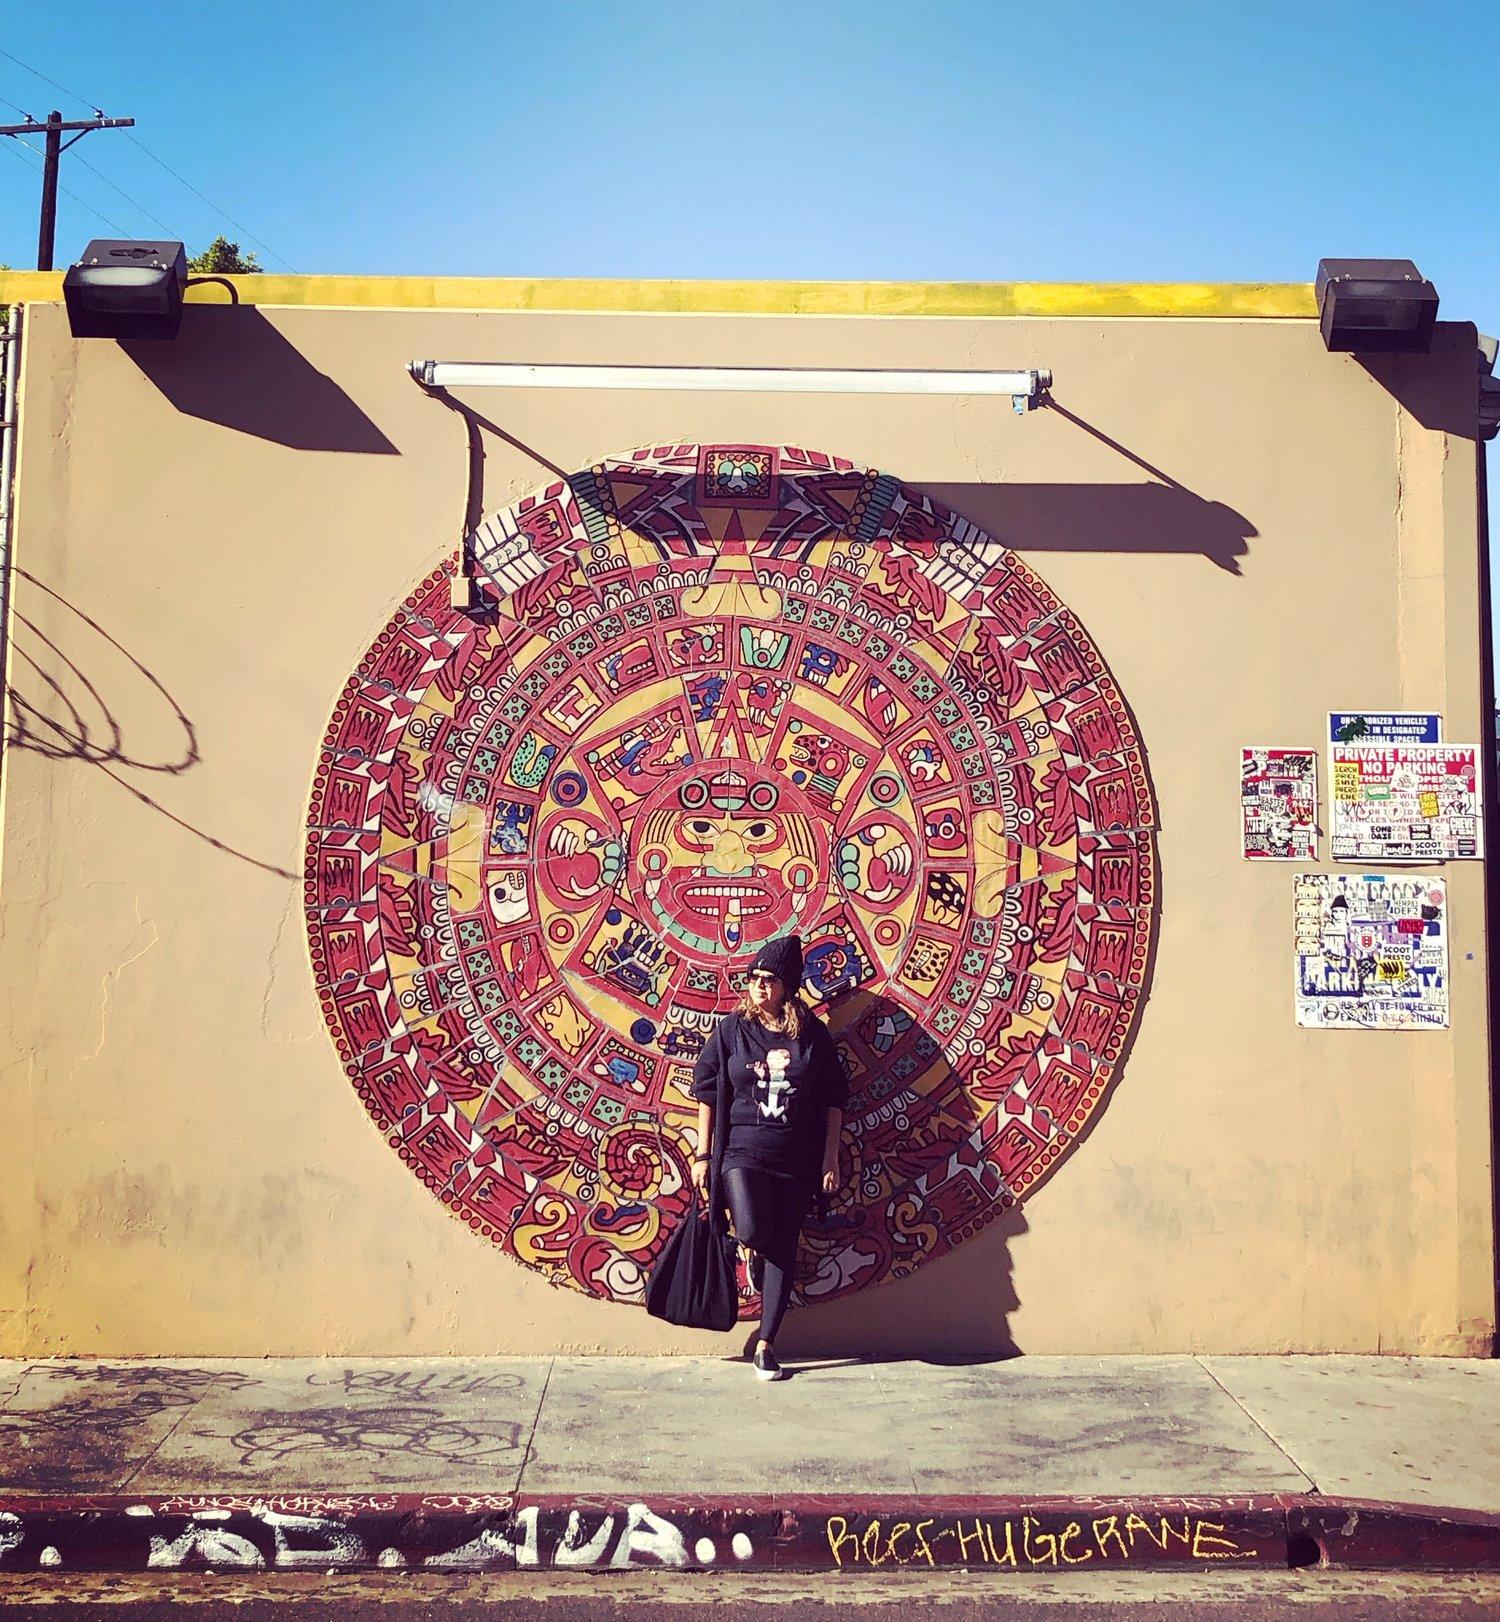 Amy Rose Sin Ropa barrio dysmorphia